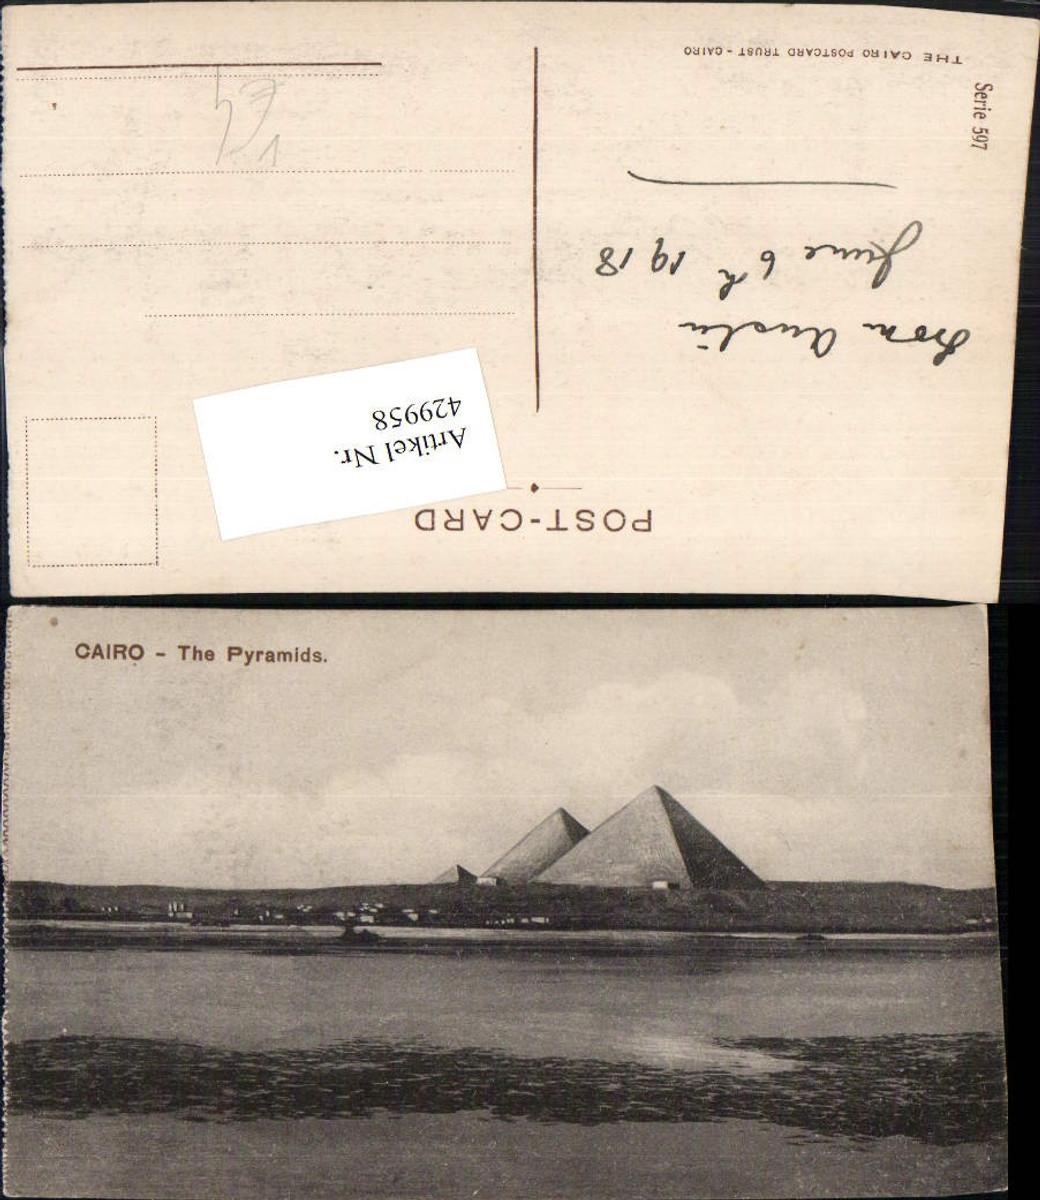 429958,Egypt Cairo Kairo Pyramids Pyramiden pub Postcard Trust 597 günstig online kaufen